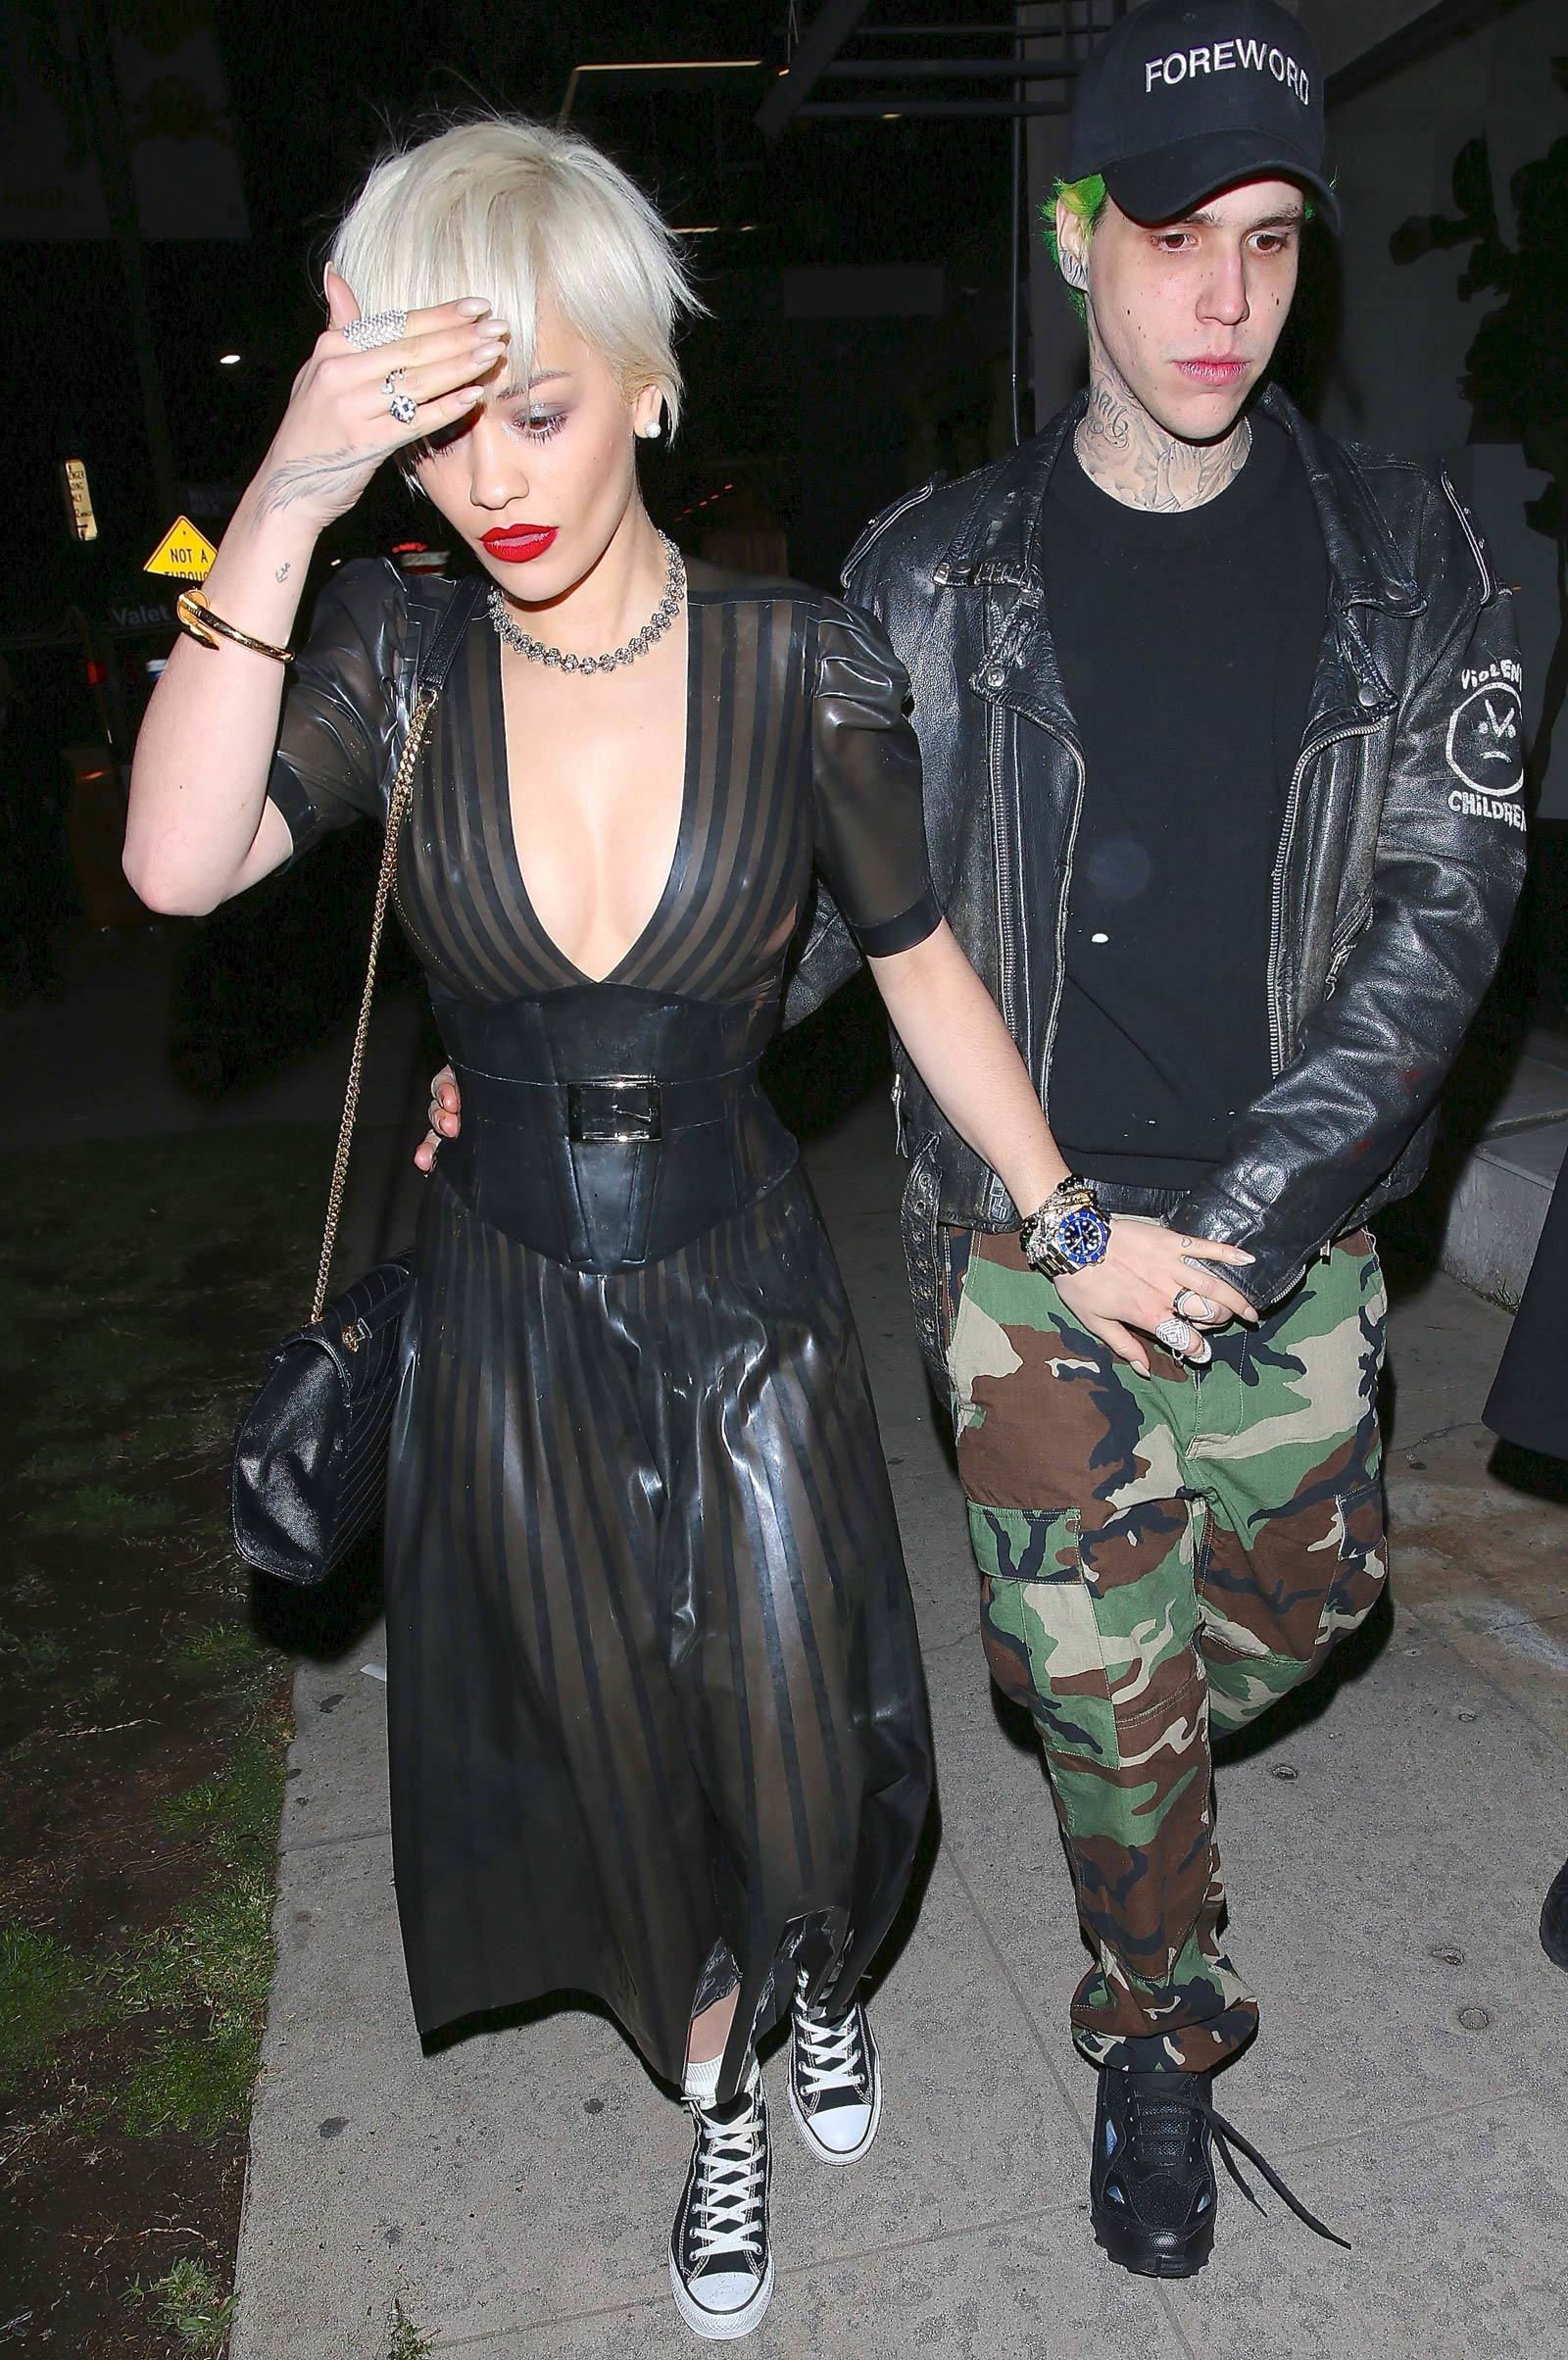 Rita Ora leaving The Nice Guy in Los Angeles